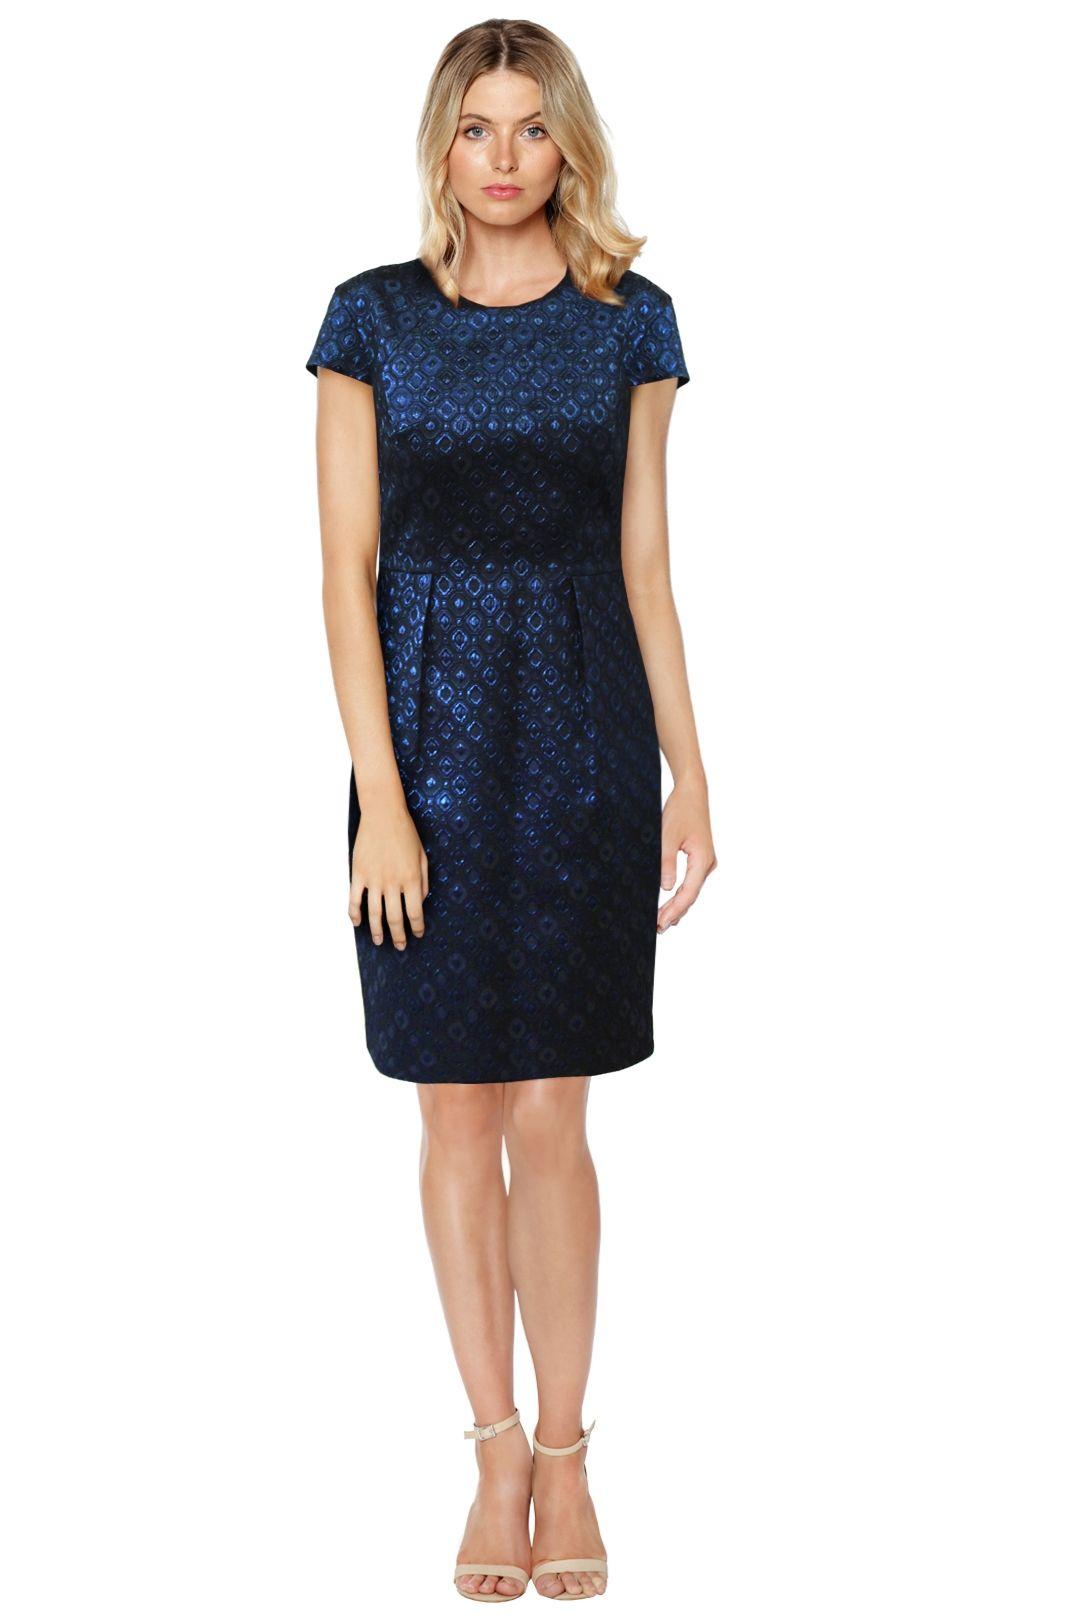 Ginger Smart - Metal Heart Dress - Blue - Front